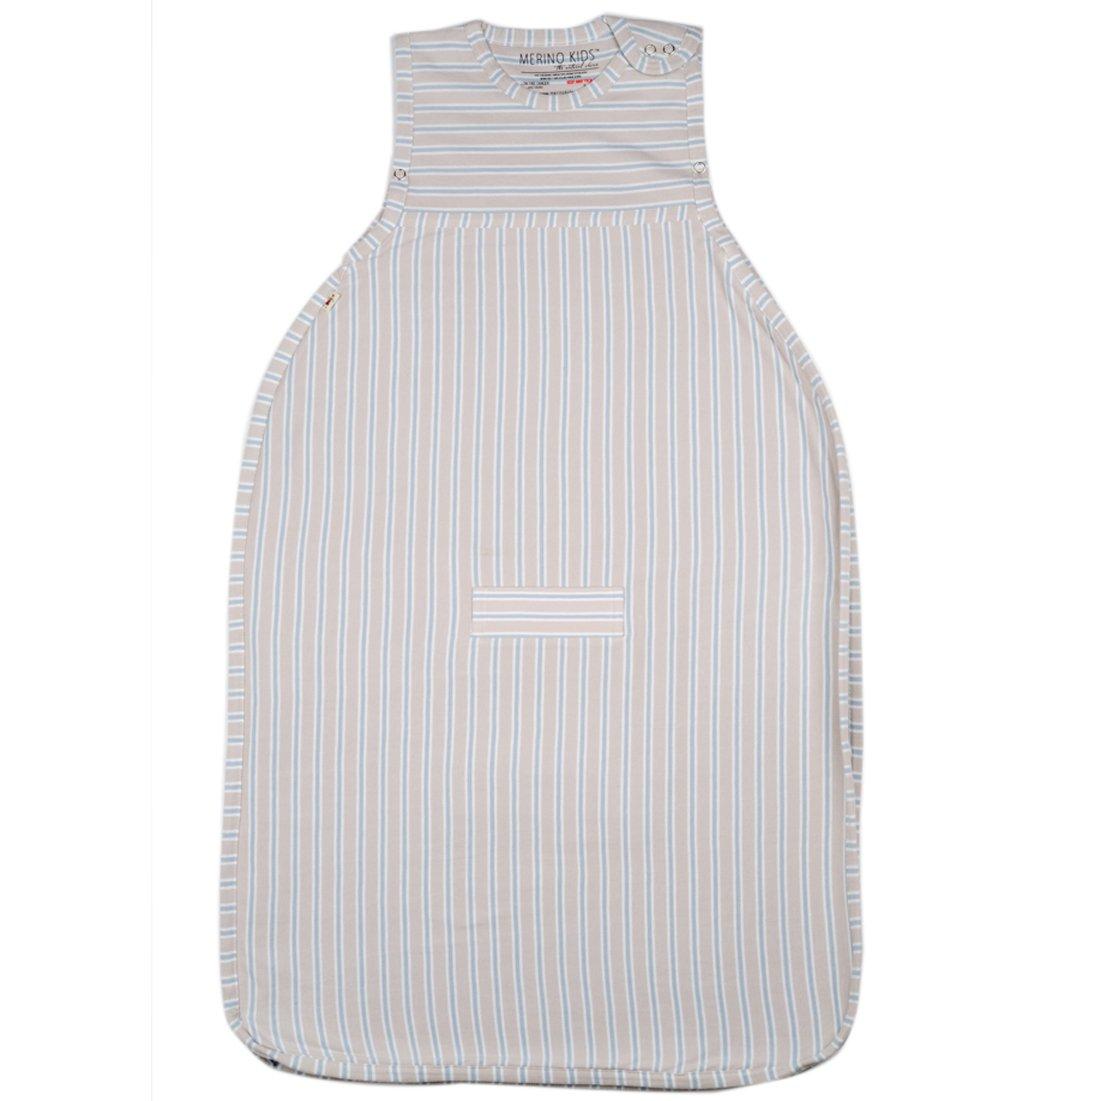 Merino Kids Winter-Weight Baby Sleep Bag For Babies 0-2 Years, Light Grey/Grey Stripe